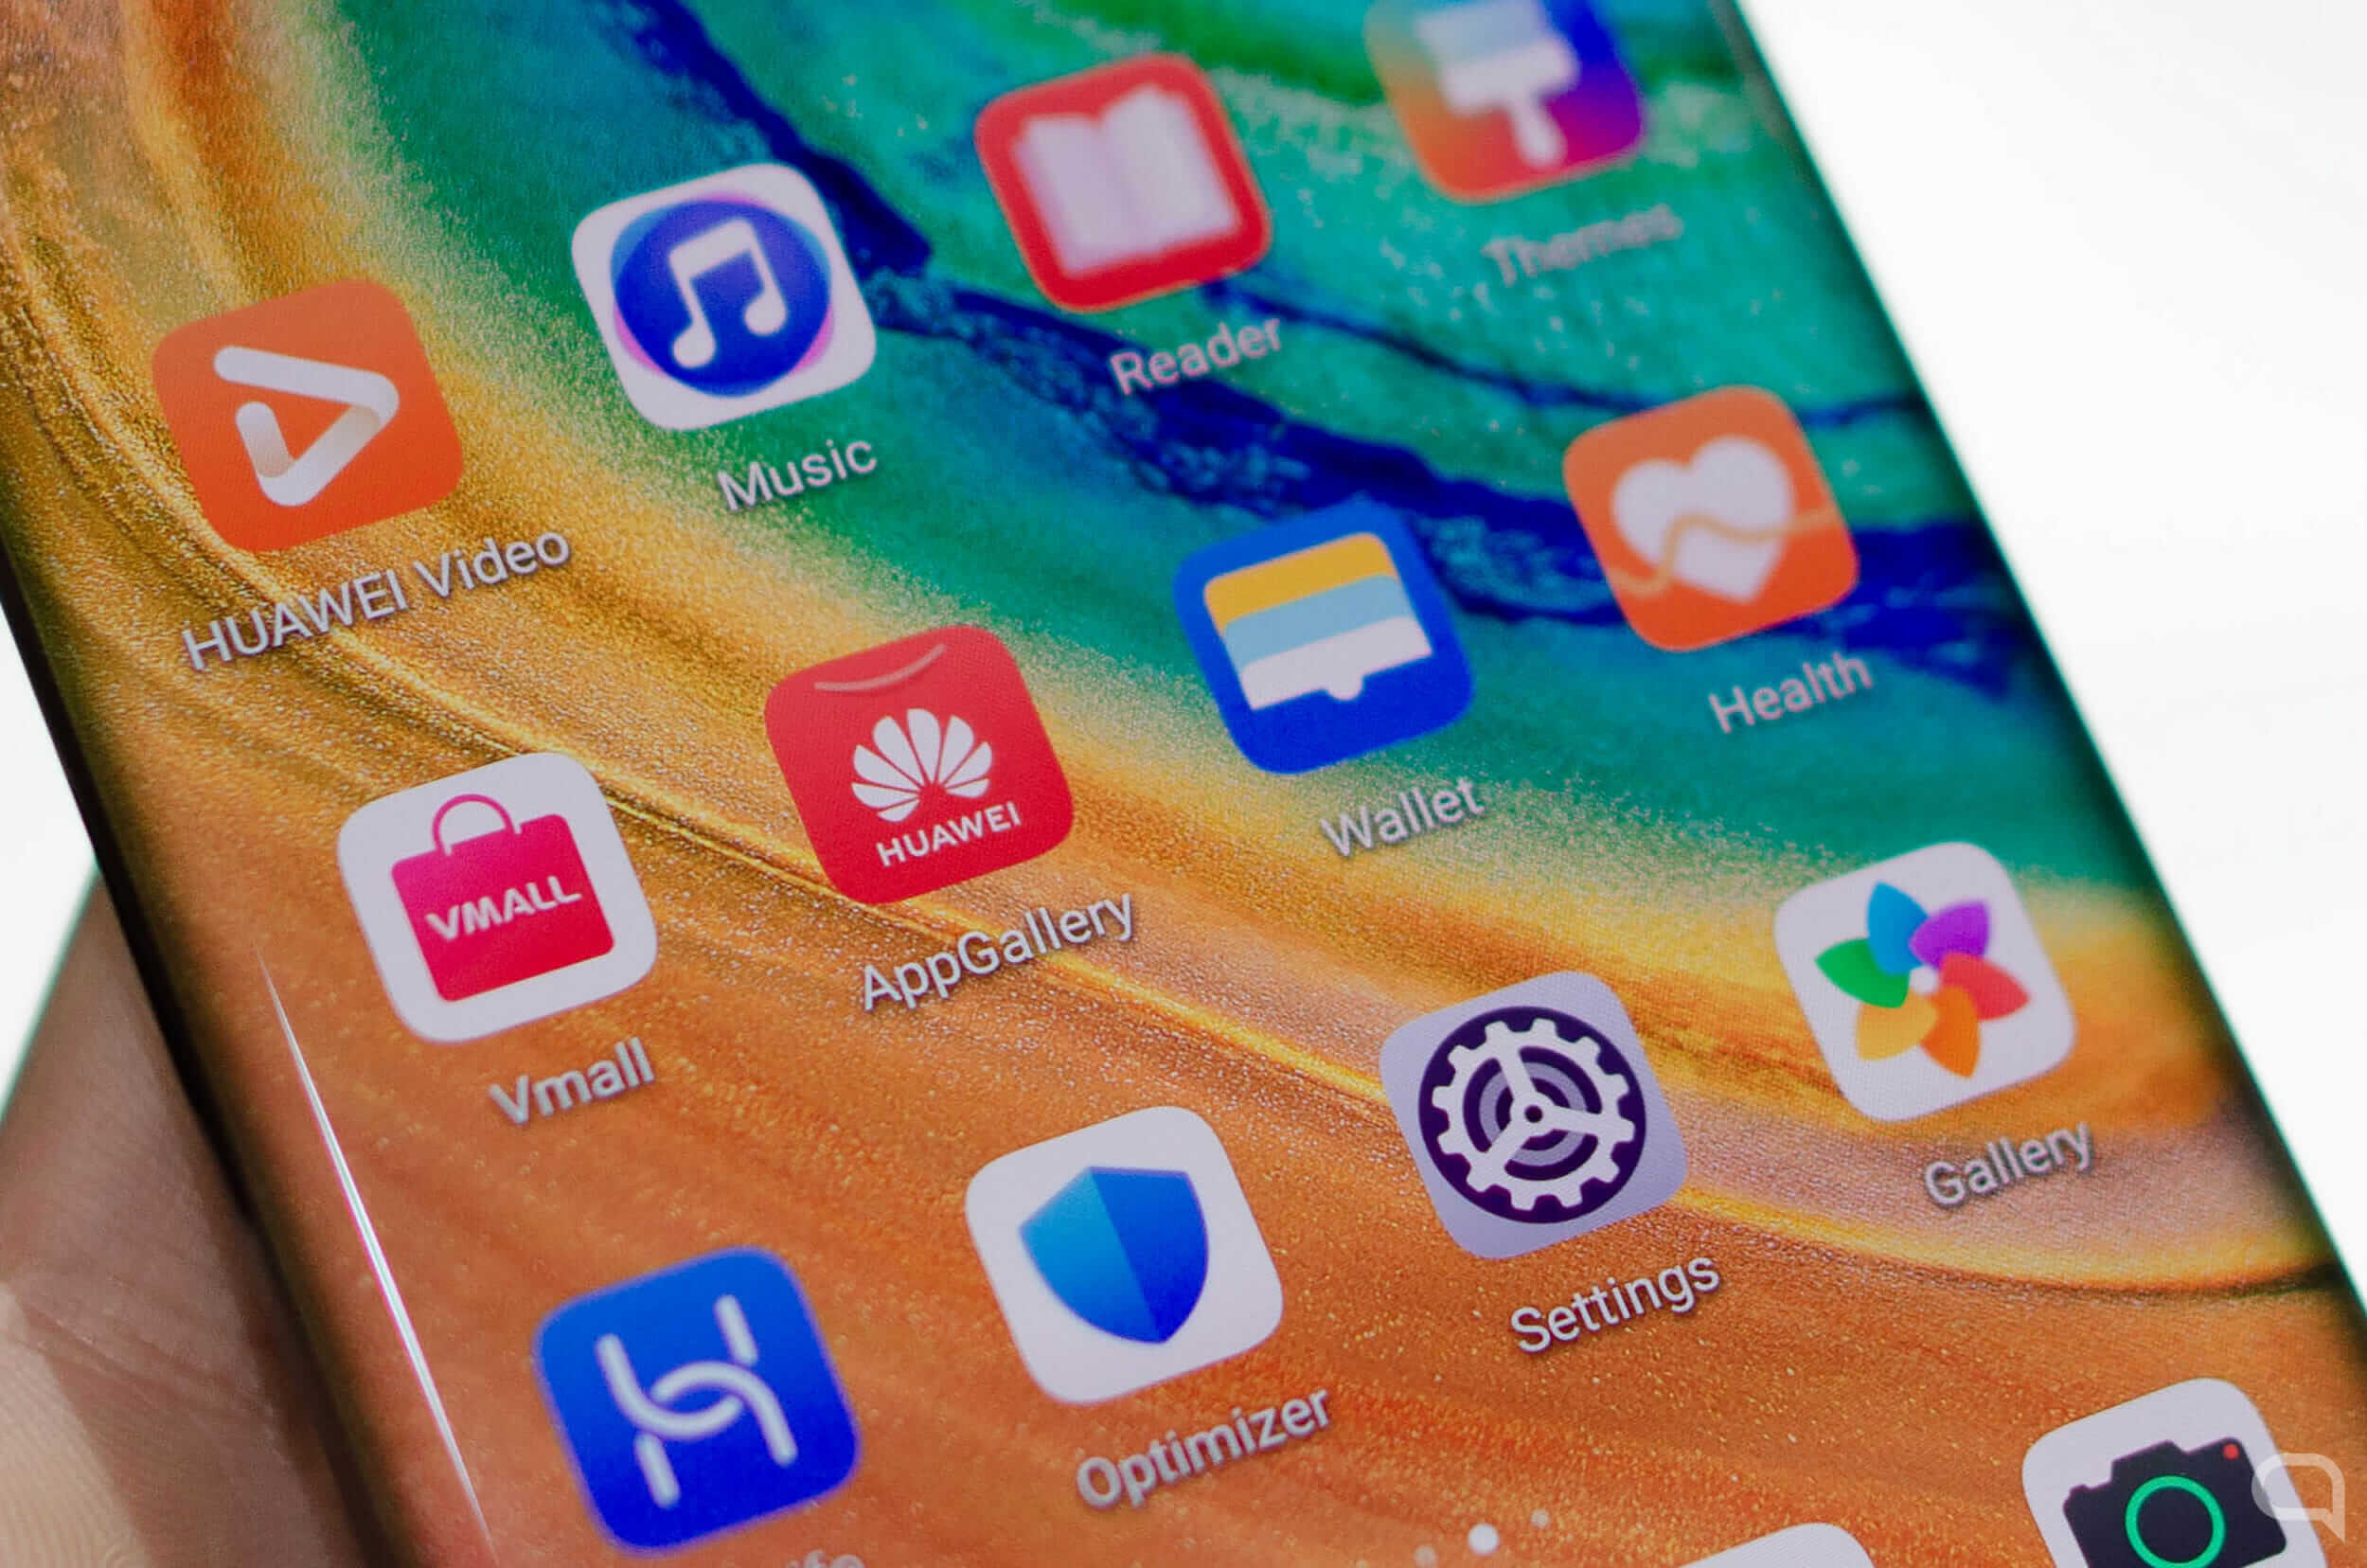 Huawei Apps AppGallery